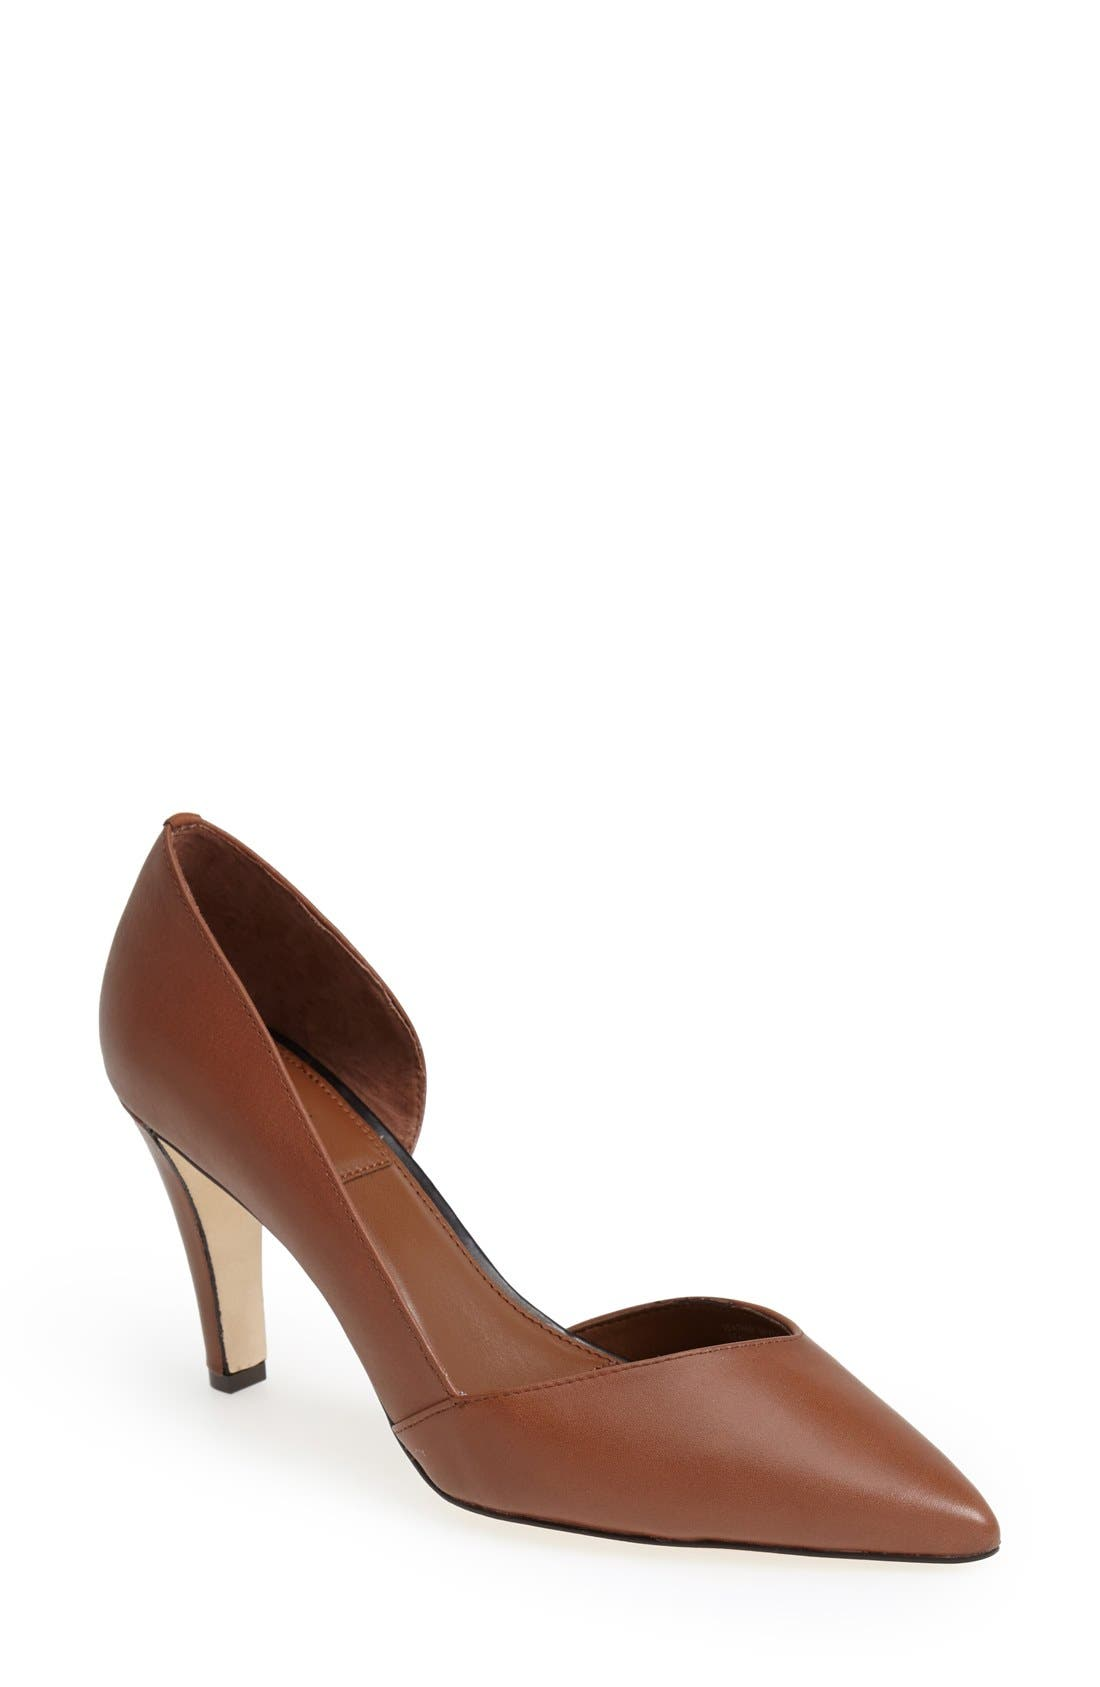 Main Image - T Tahari 'Lars' Pointy Toe Leather Pump (Women)